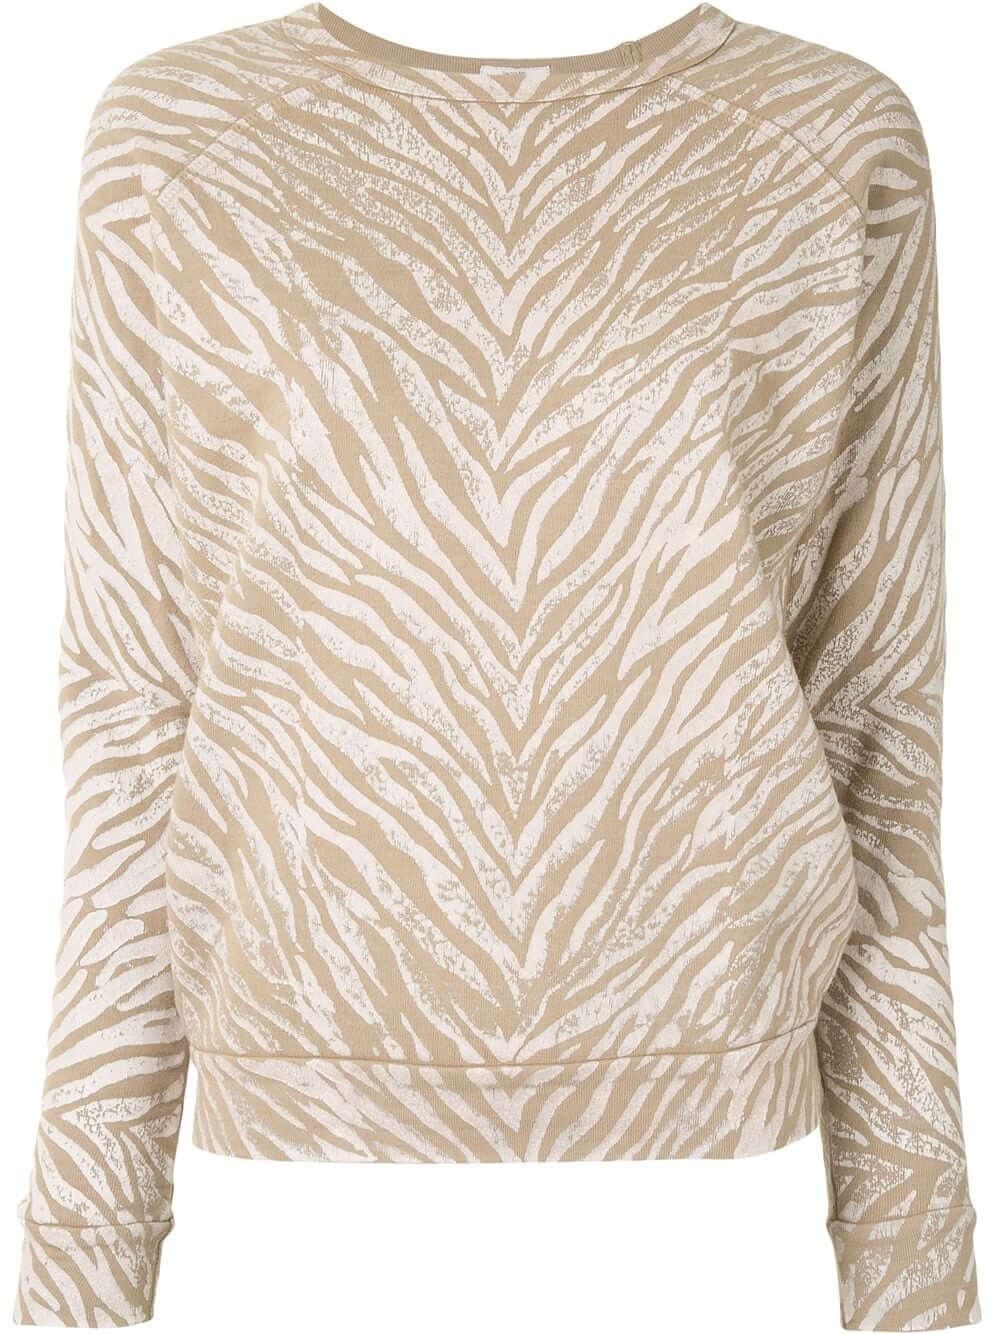 The Hugger Striped Sweatshirt Item # 8172-792-WSR